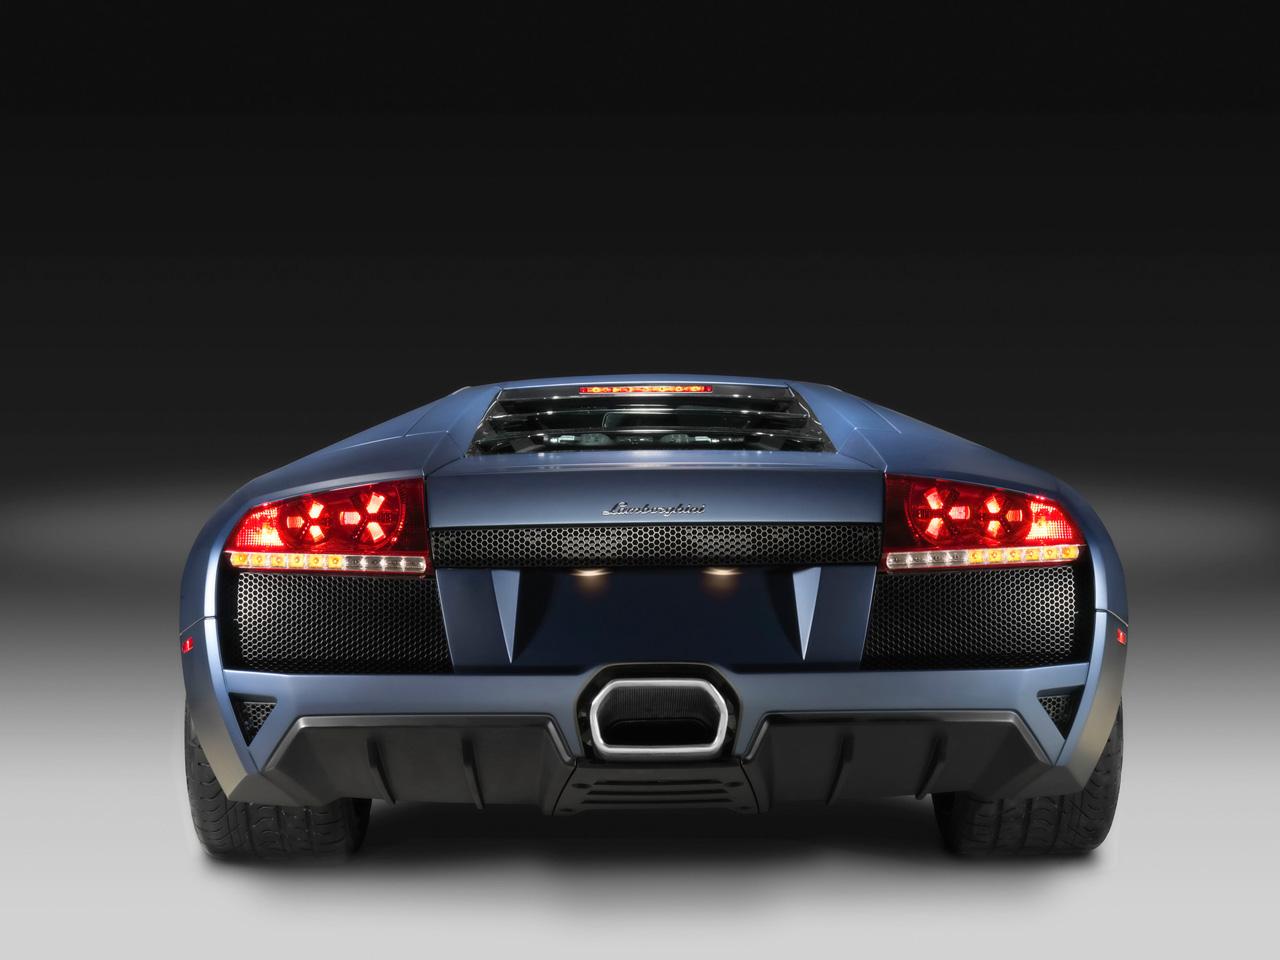 Lamborghini Murcielago Back